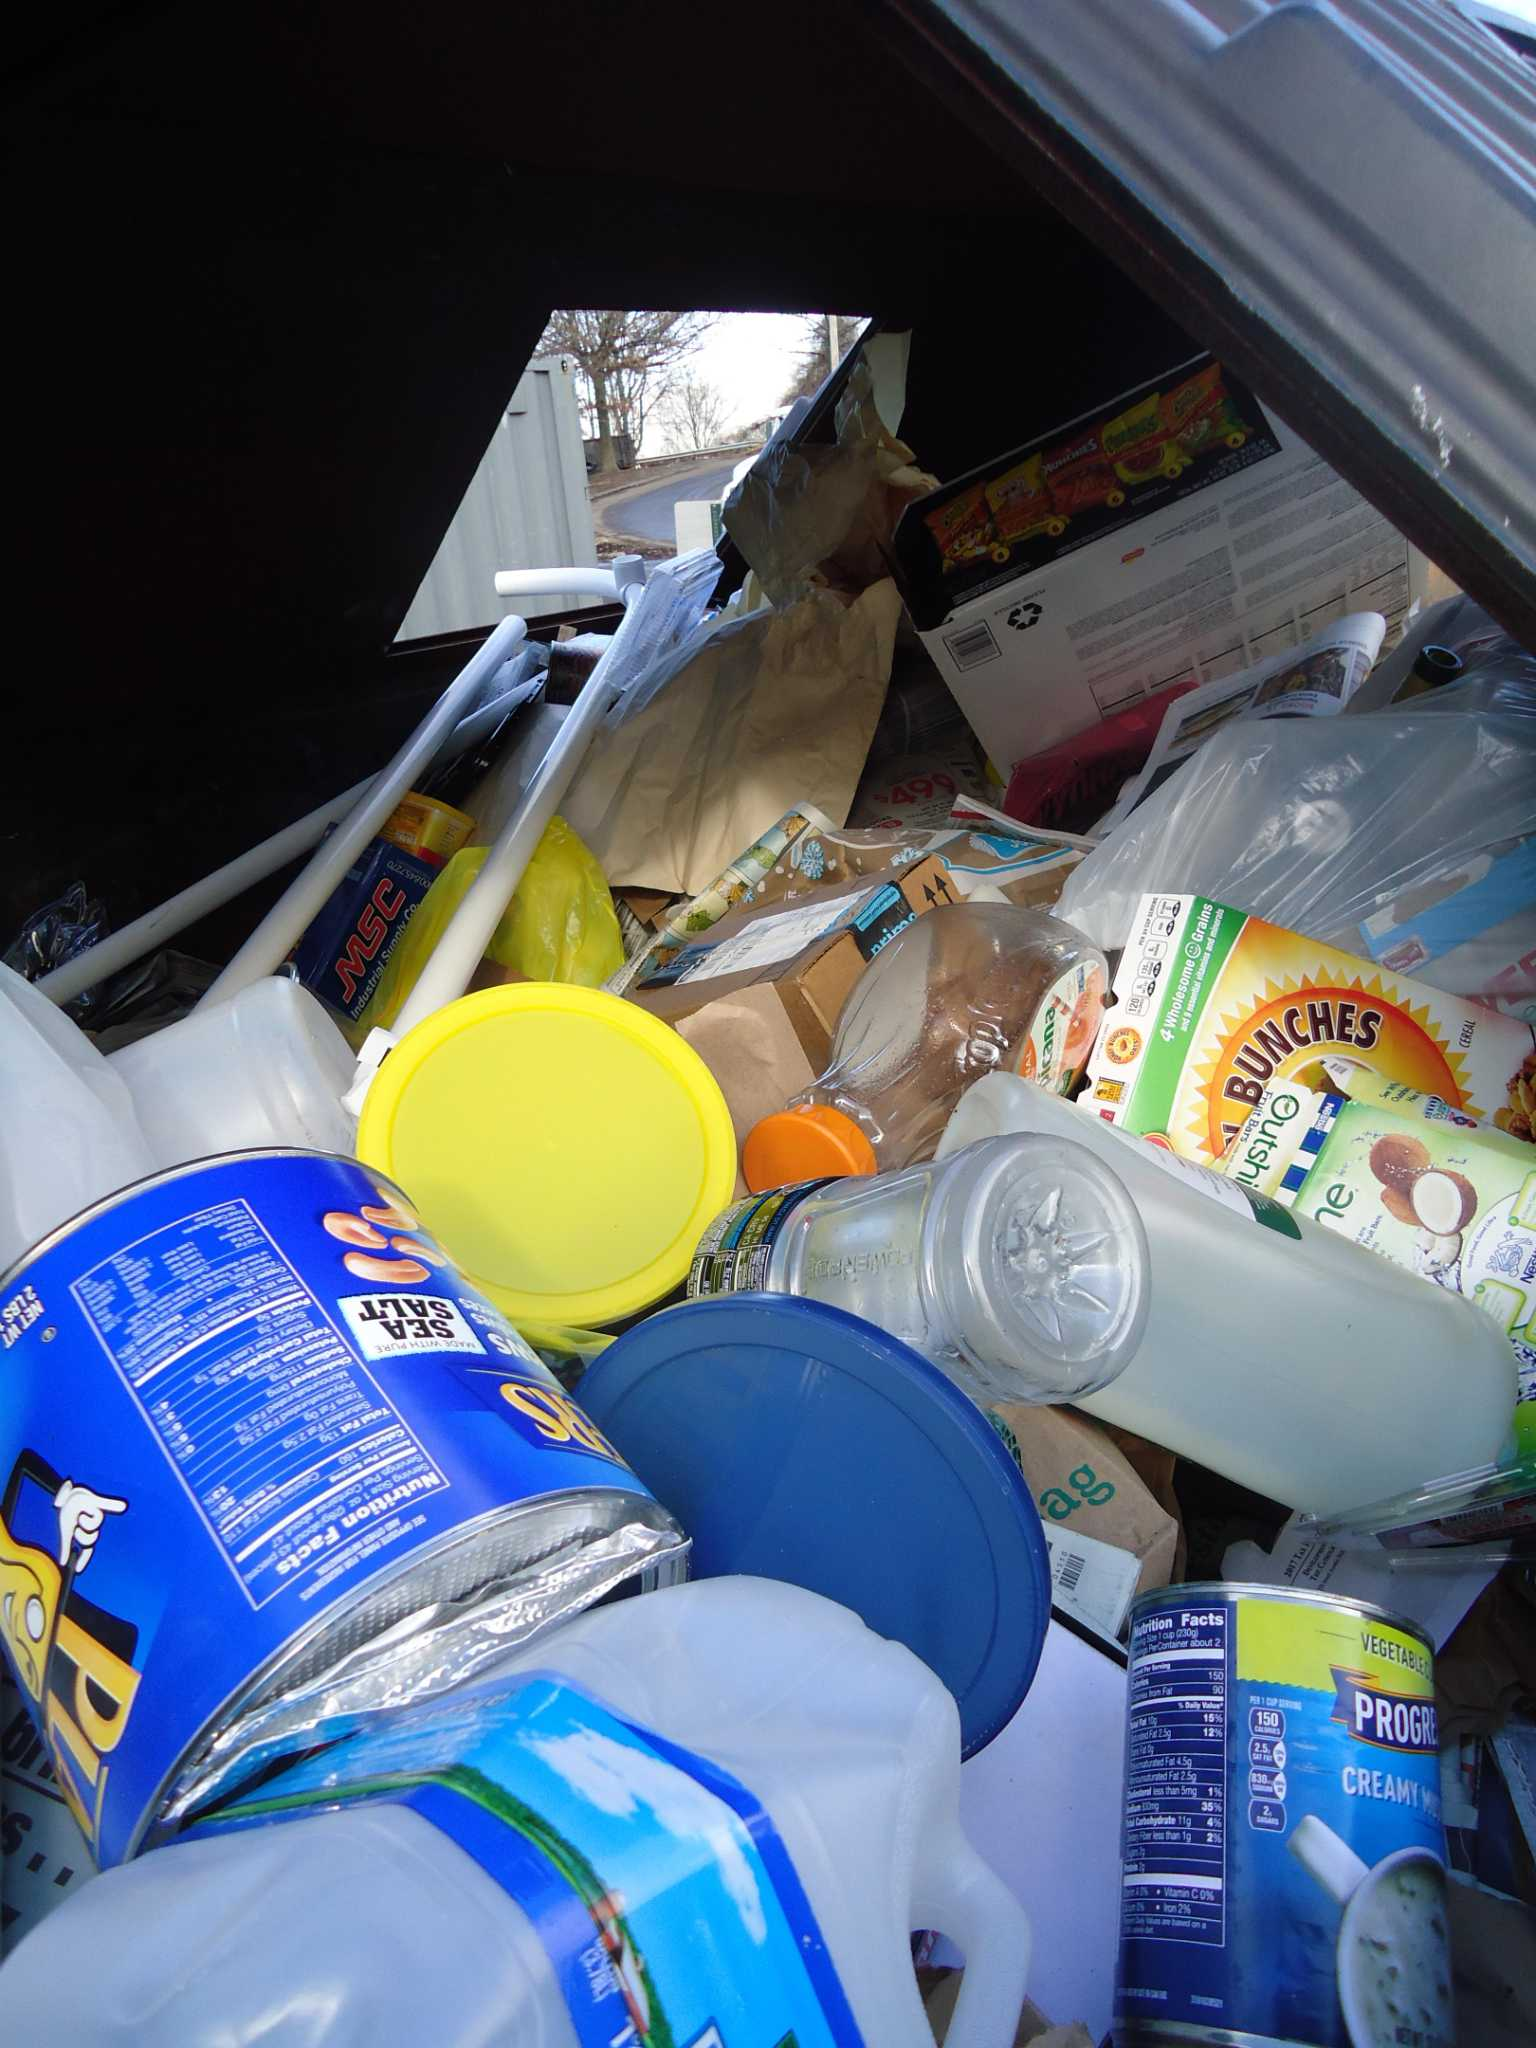 Recycling headache: Separating materials a tough job